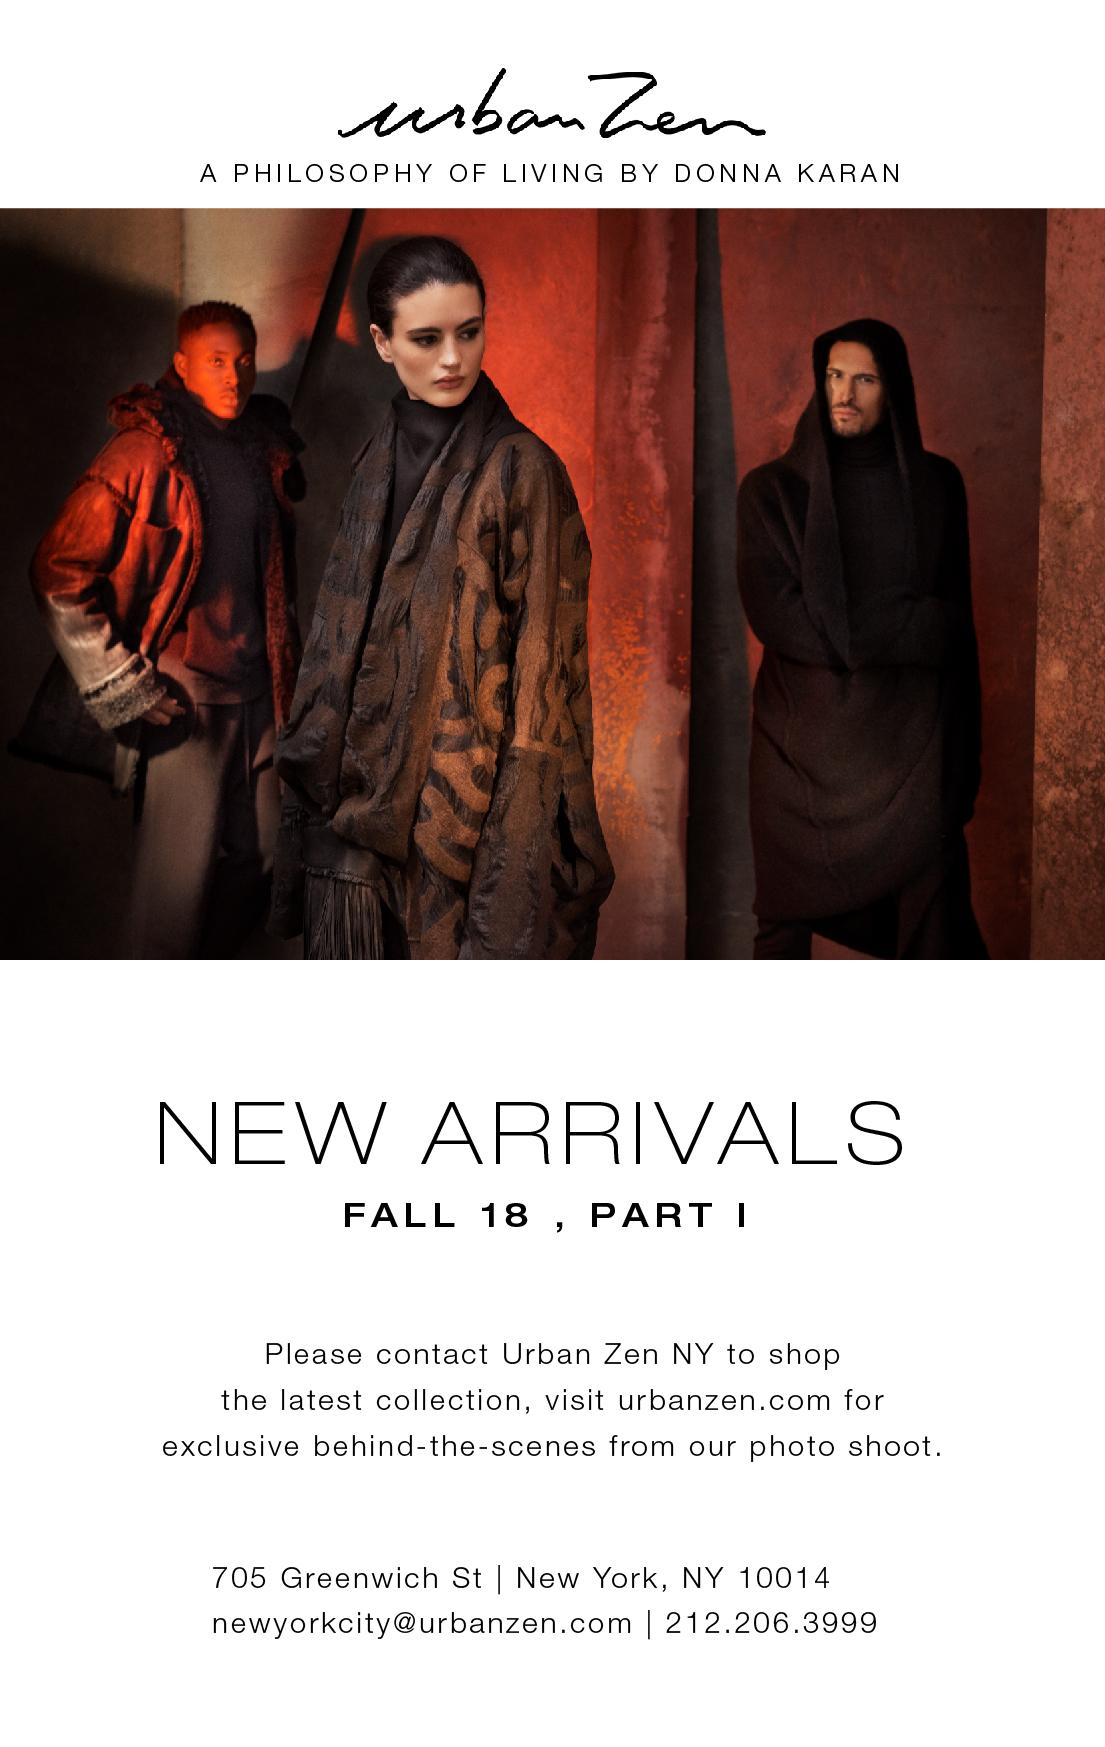 NYC-location-cards-04.jpg